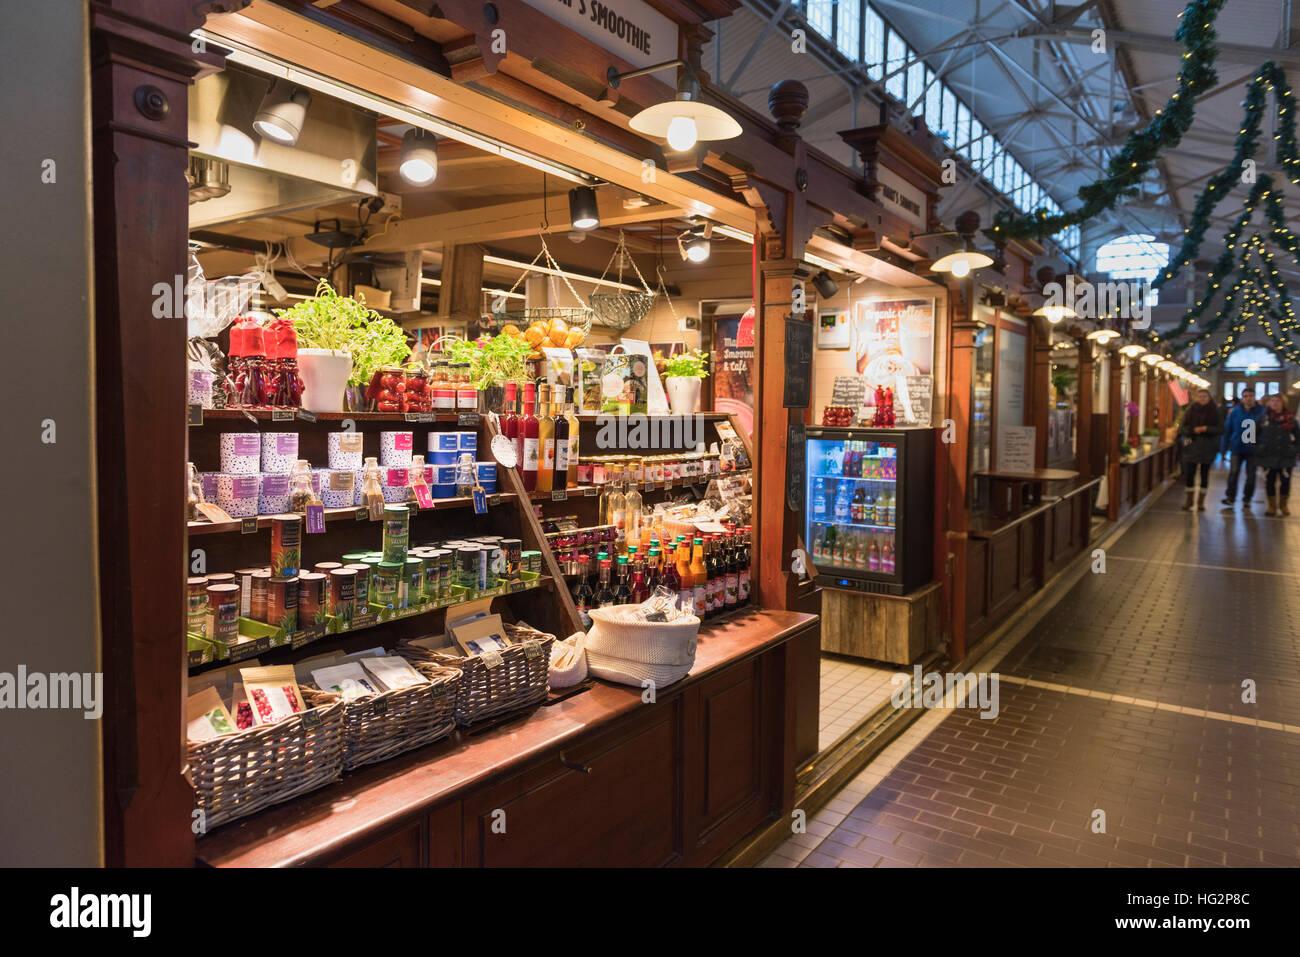 Old Market Hall Helsinki Finland - Stock Image